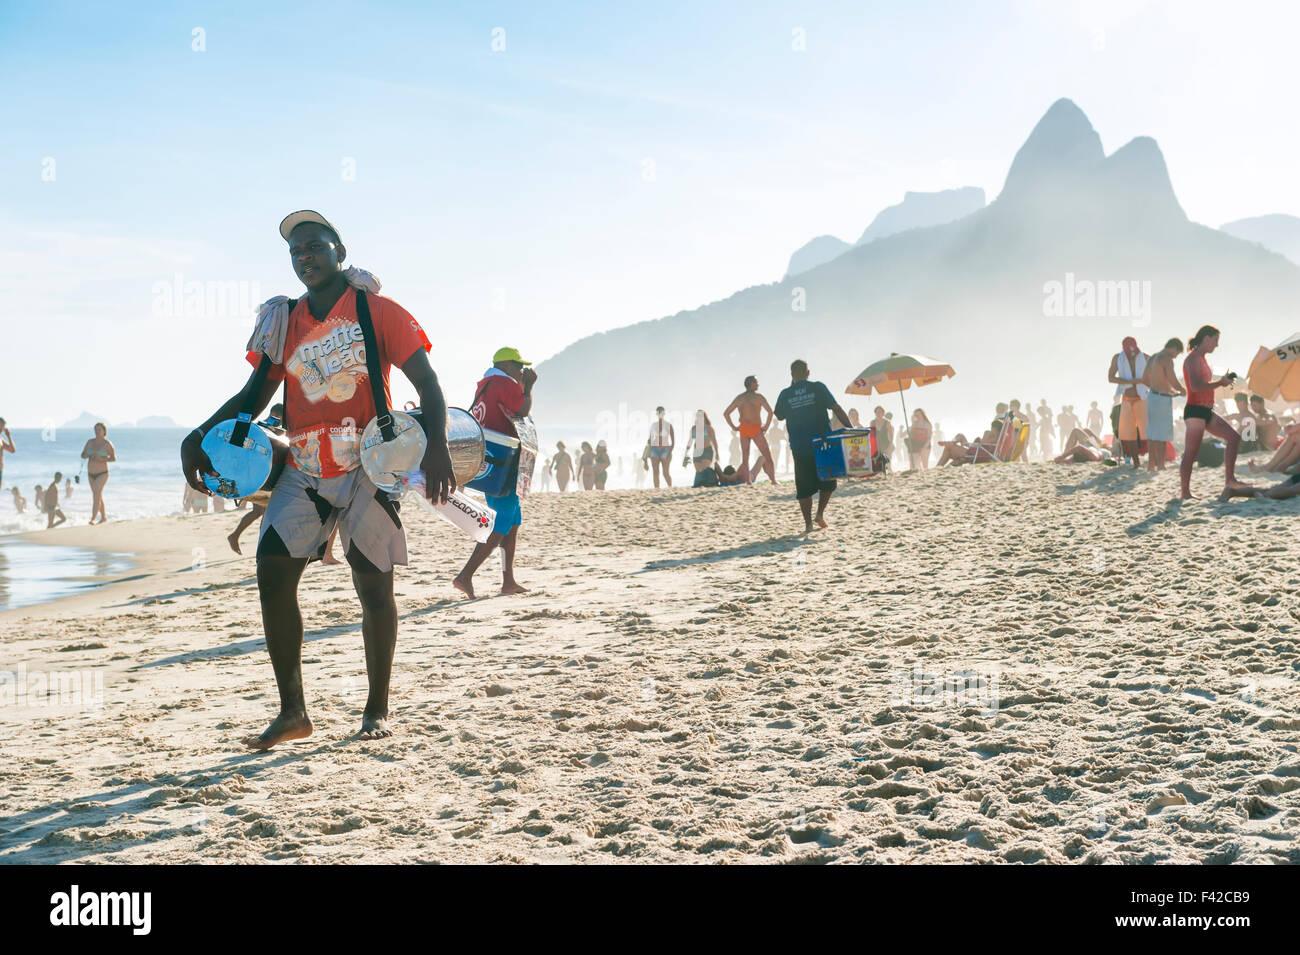 RIO DE JANEIRO, BRAZIL - JANUARY 20, 2013: Vendor selling Brazilian mate iced tea walks on Ipanema Beach on a misty - Stock Image